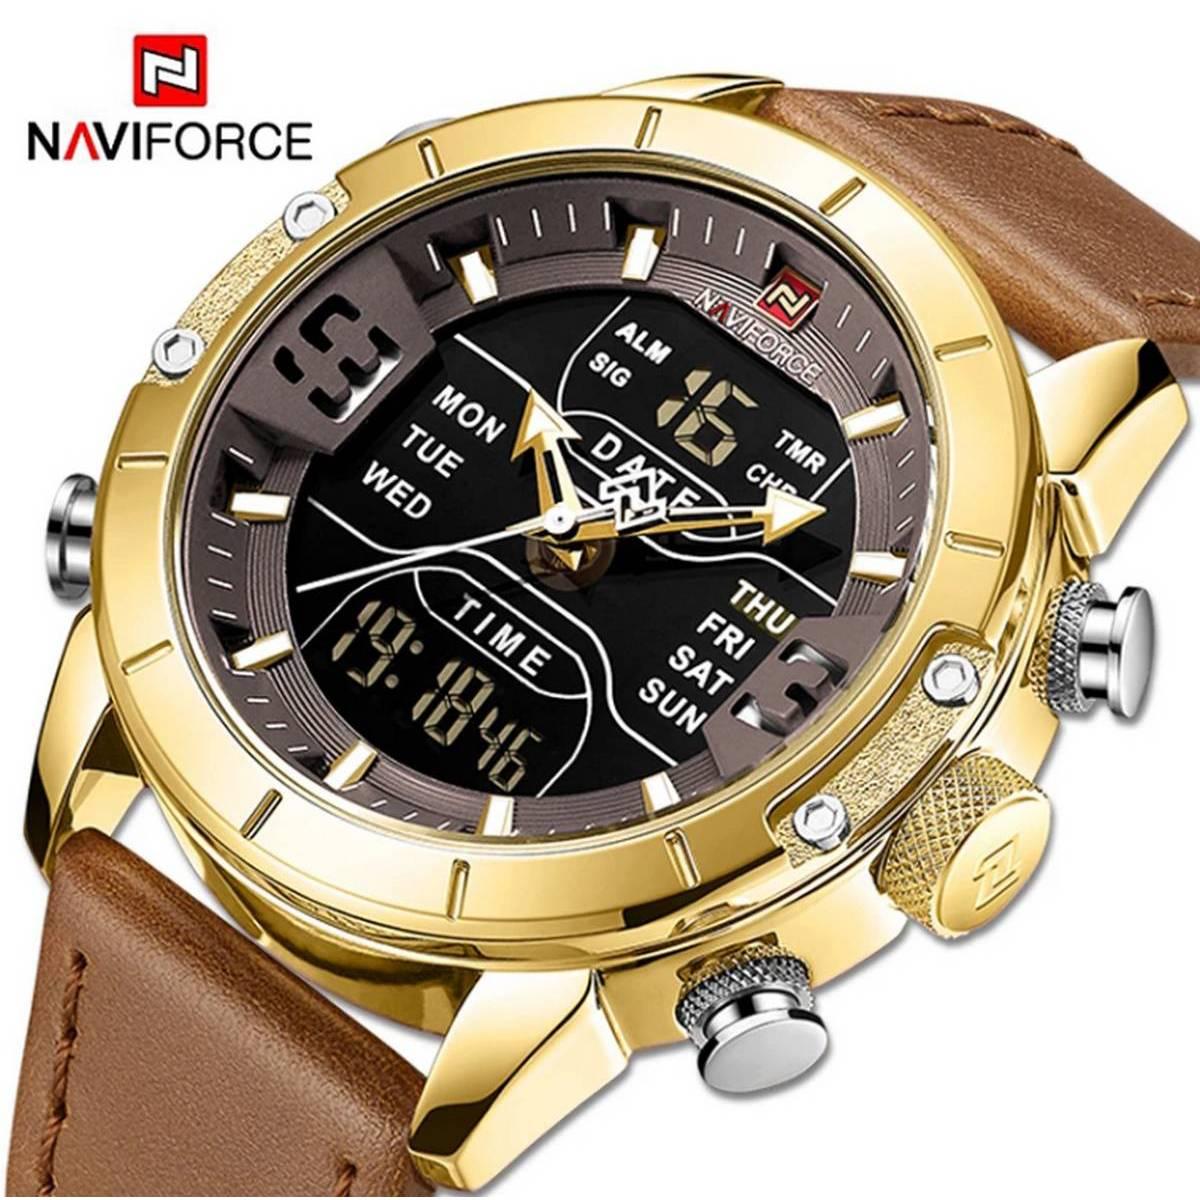 NAVIFORCE 9153 Japan Movement Dual Display Leather Straps Quartz Waterproof Men's Watch With Brand Box